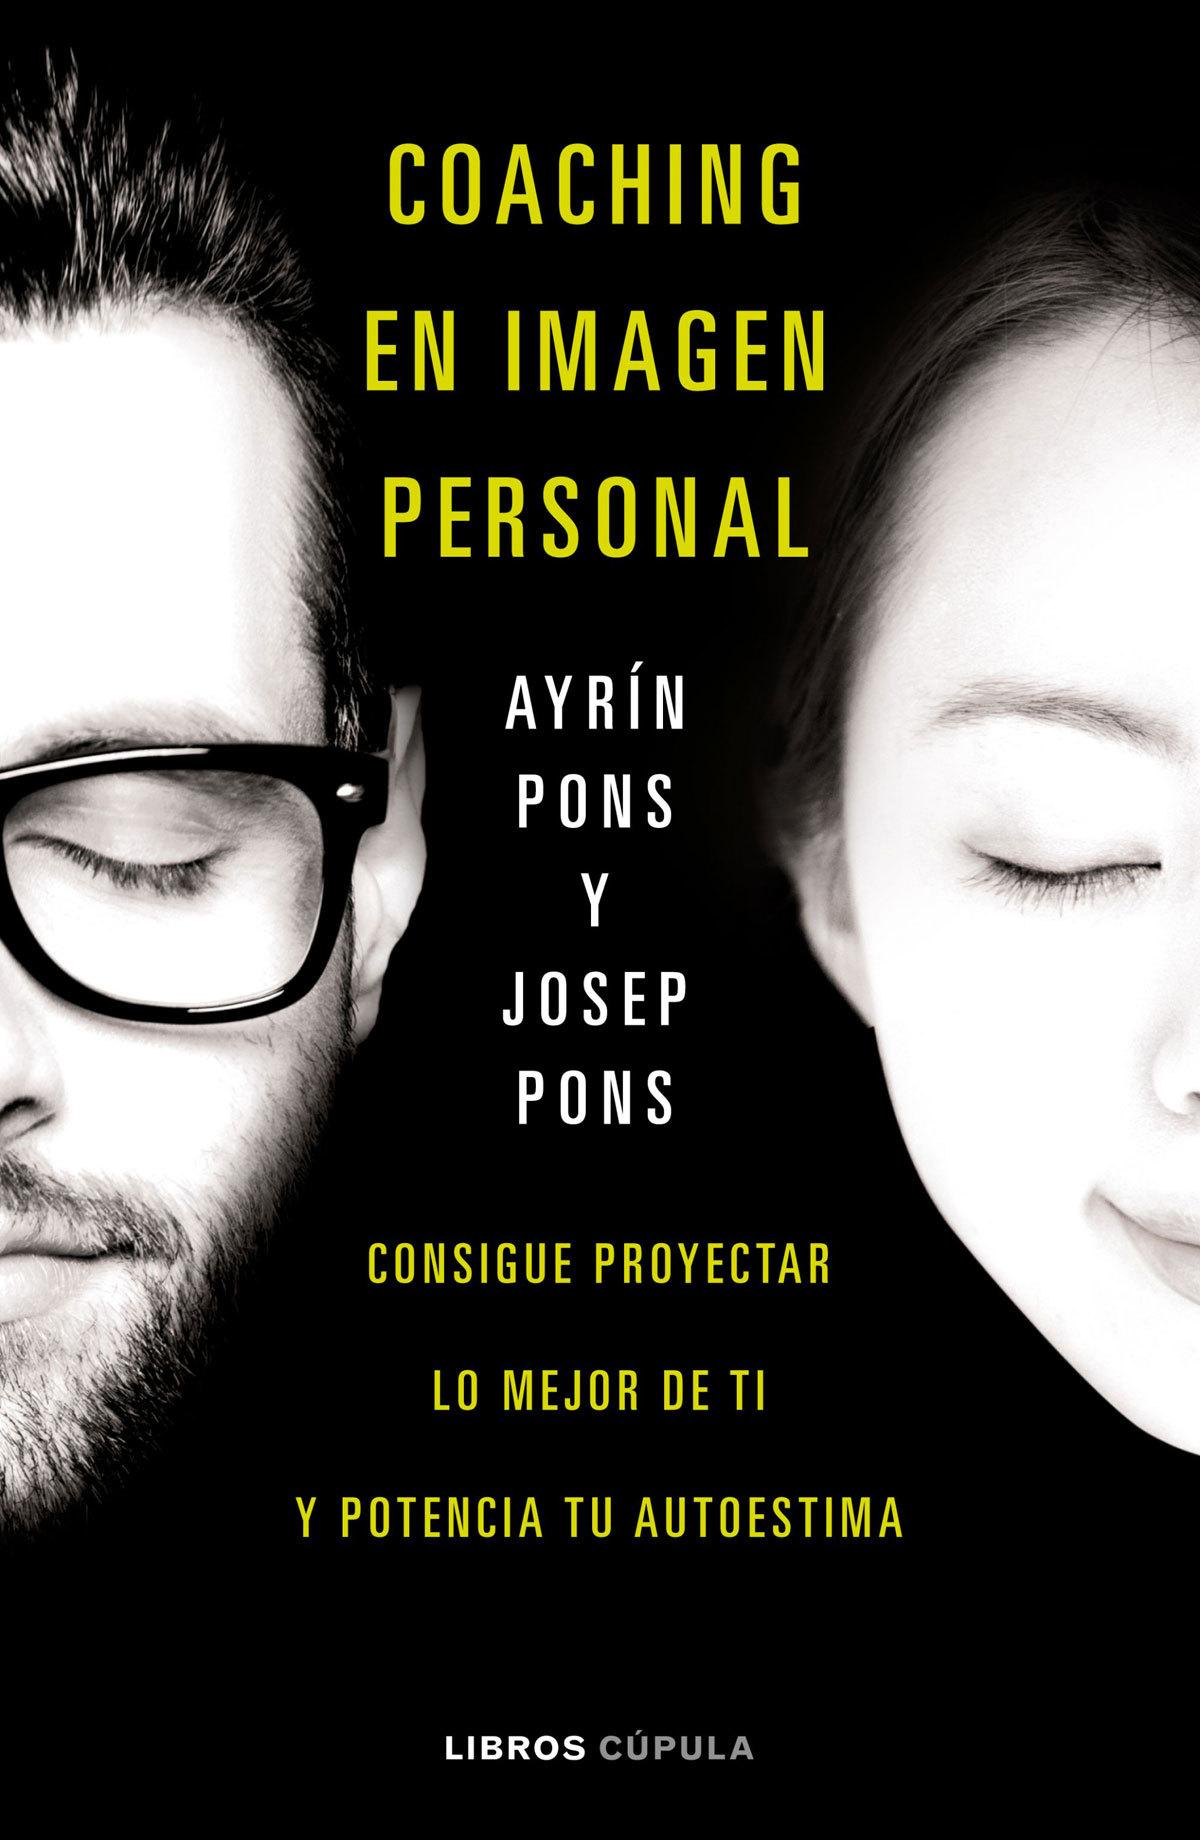 <em>Coaching en imagen personal</em>, de Ayrin Pons y Josep Pons...